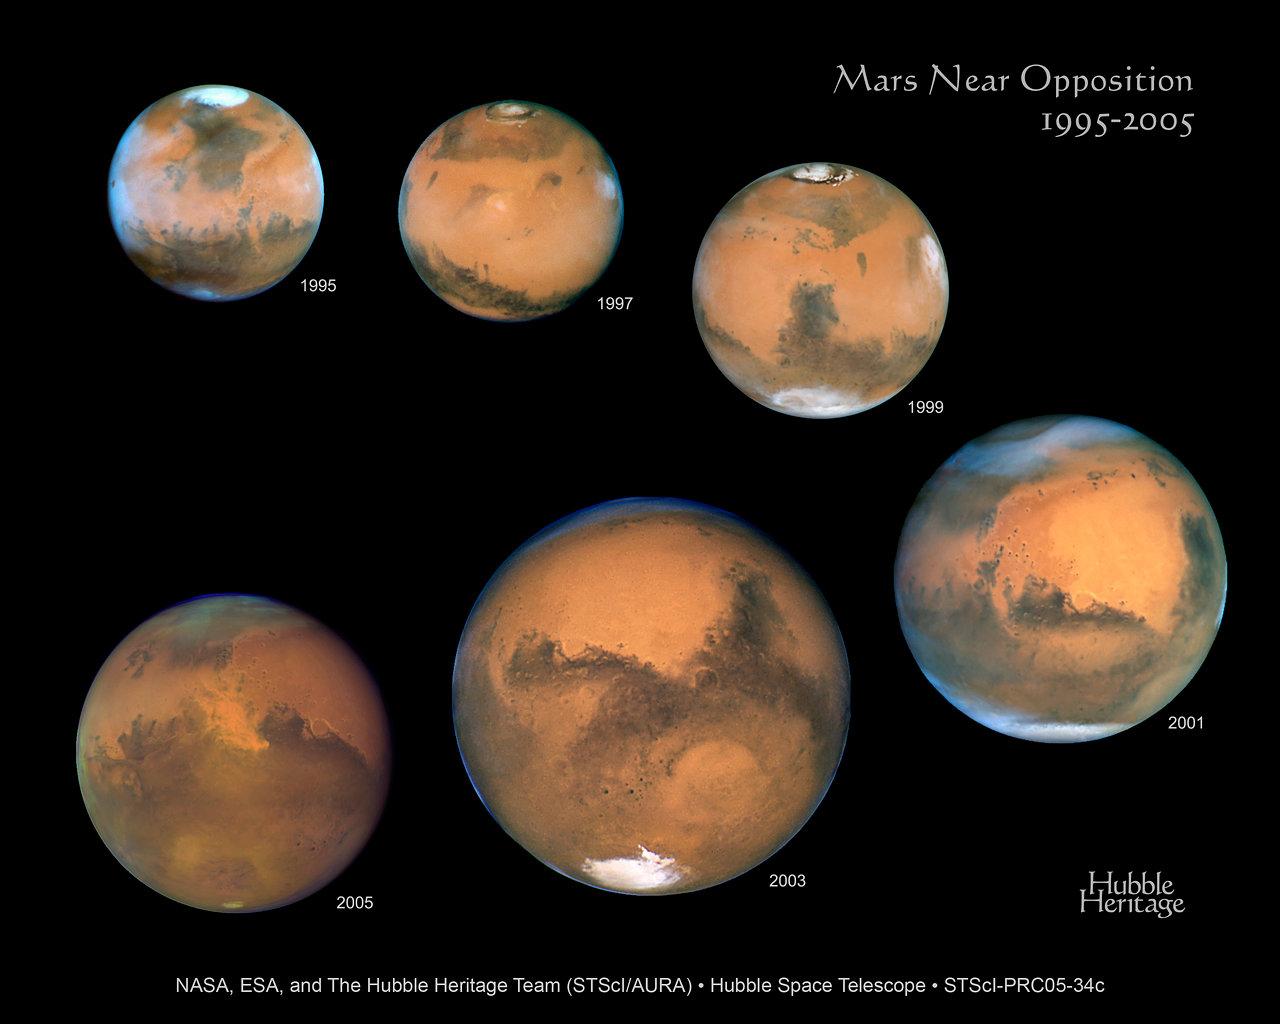 Hubble's Visual History of Mars